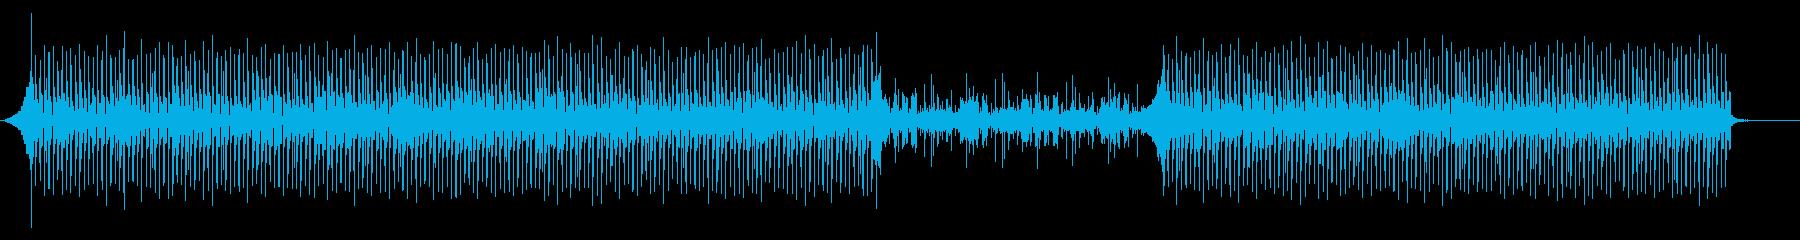 YouTubeエンティング、楽しい・軽快の再生済みの波形